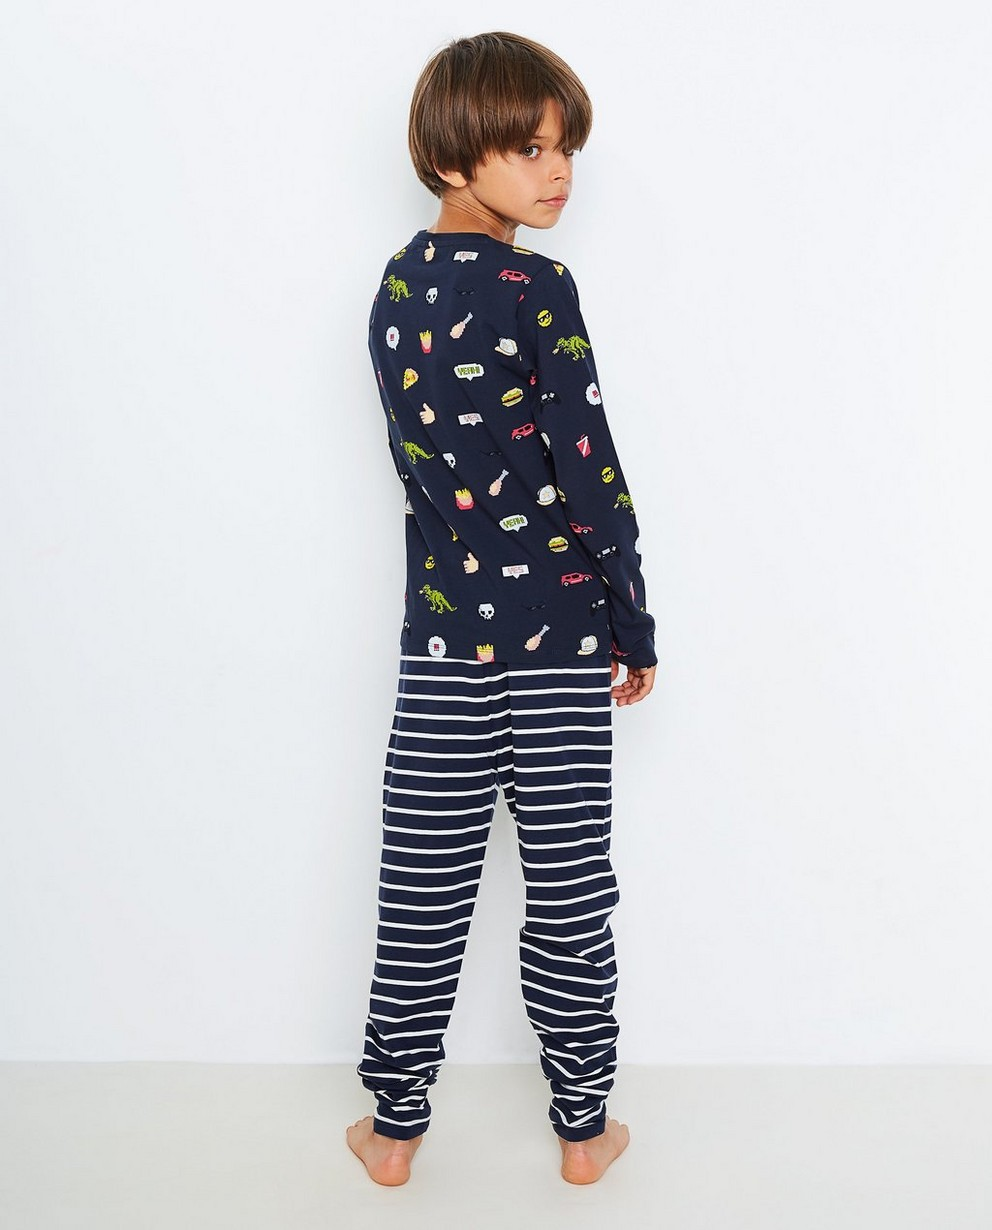 Nachtkleding - BLD - Nachtblauwe pyjama